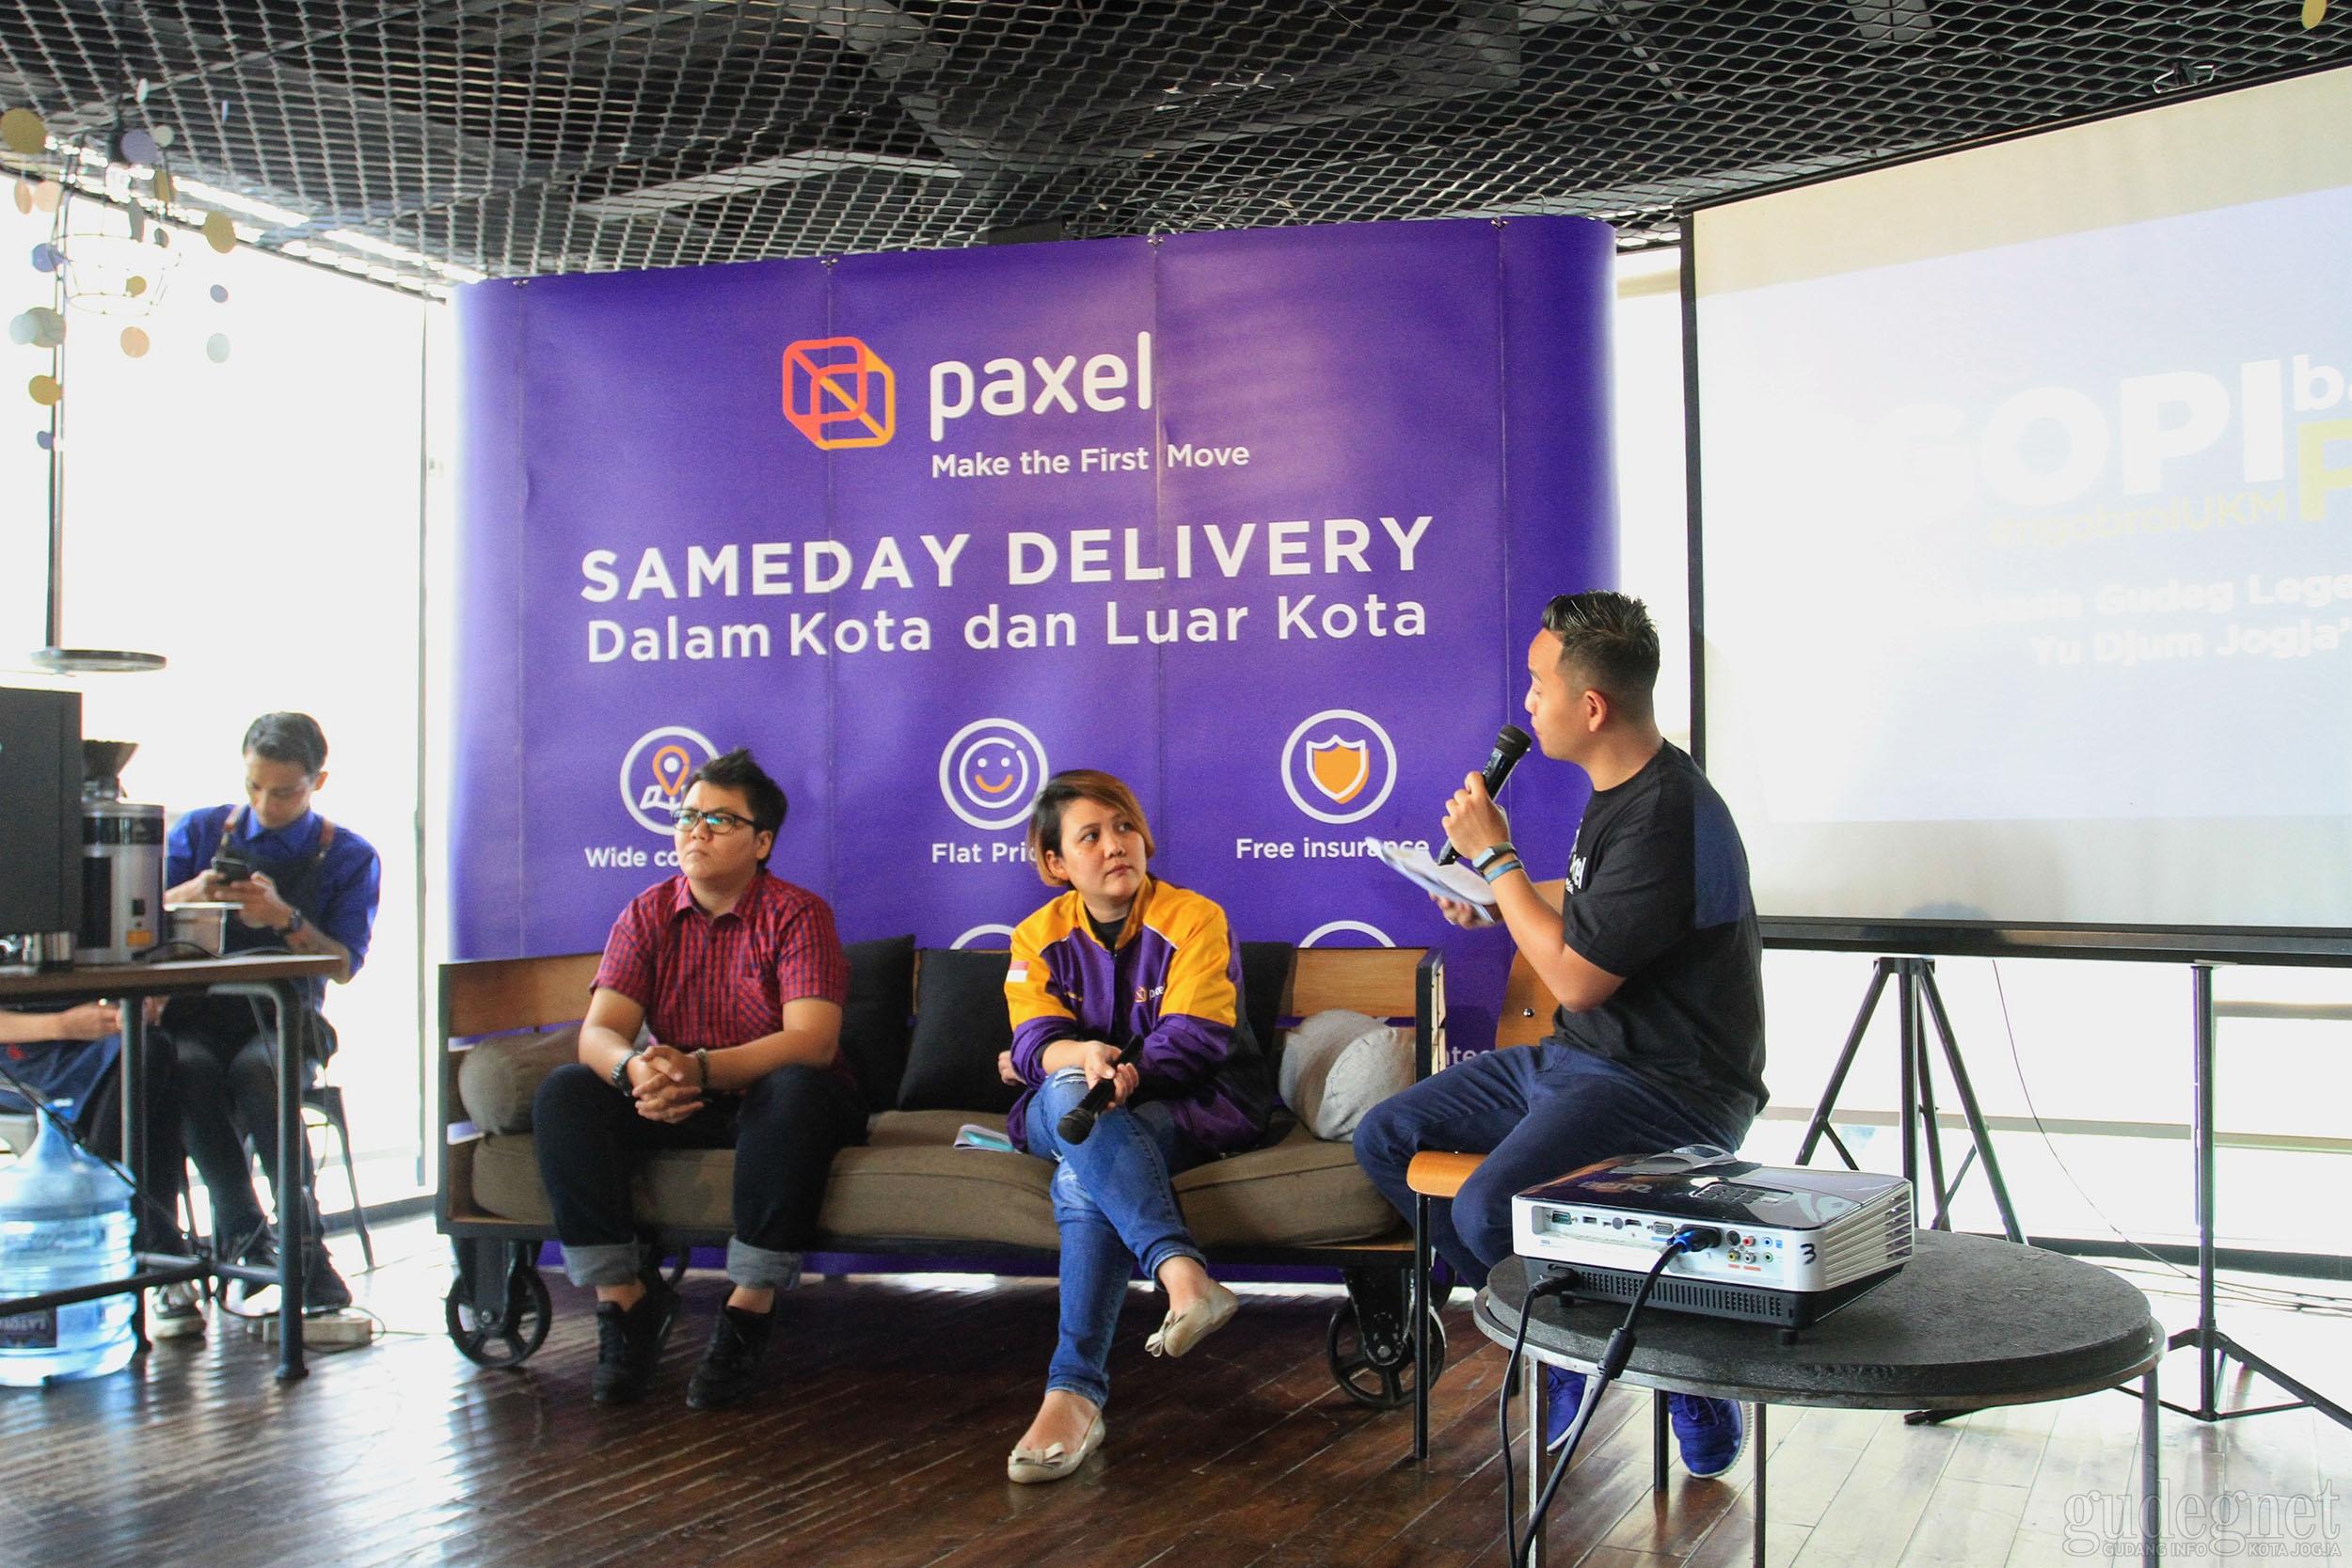 Pertahankan Eksistensi, Gudeg Yu Djum Gabung Aplikasi Paxel